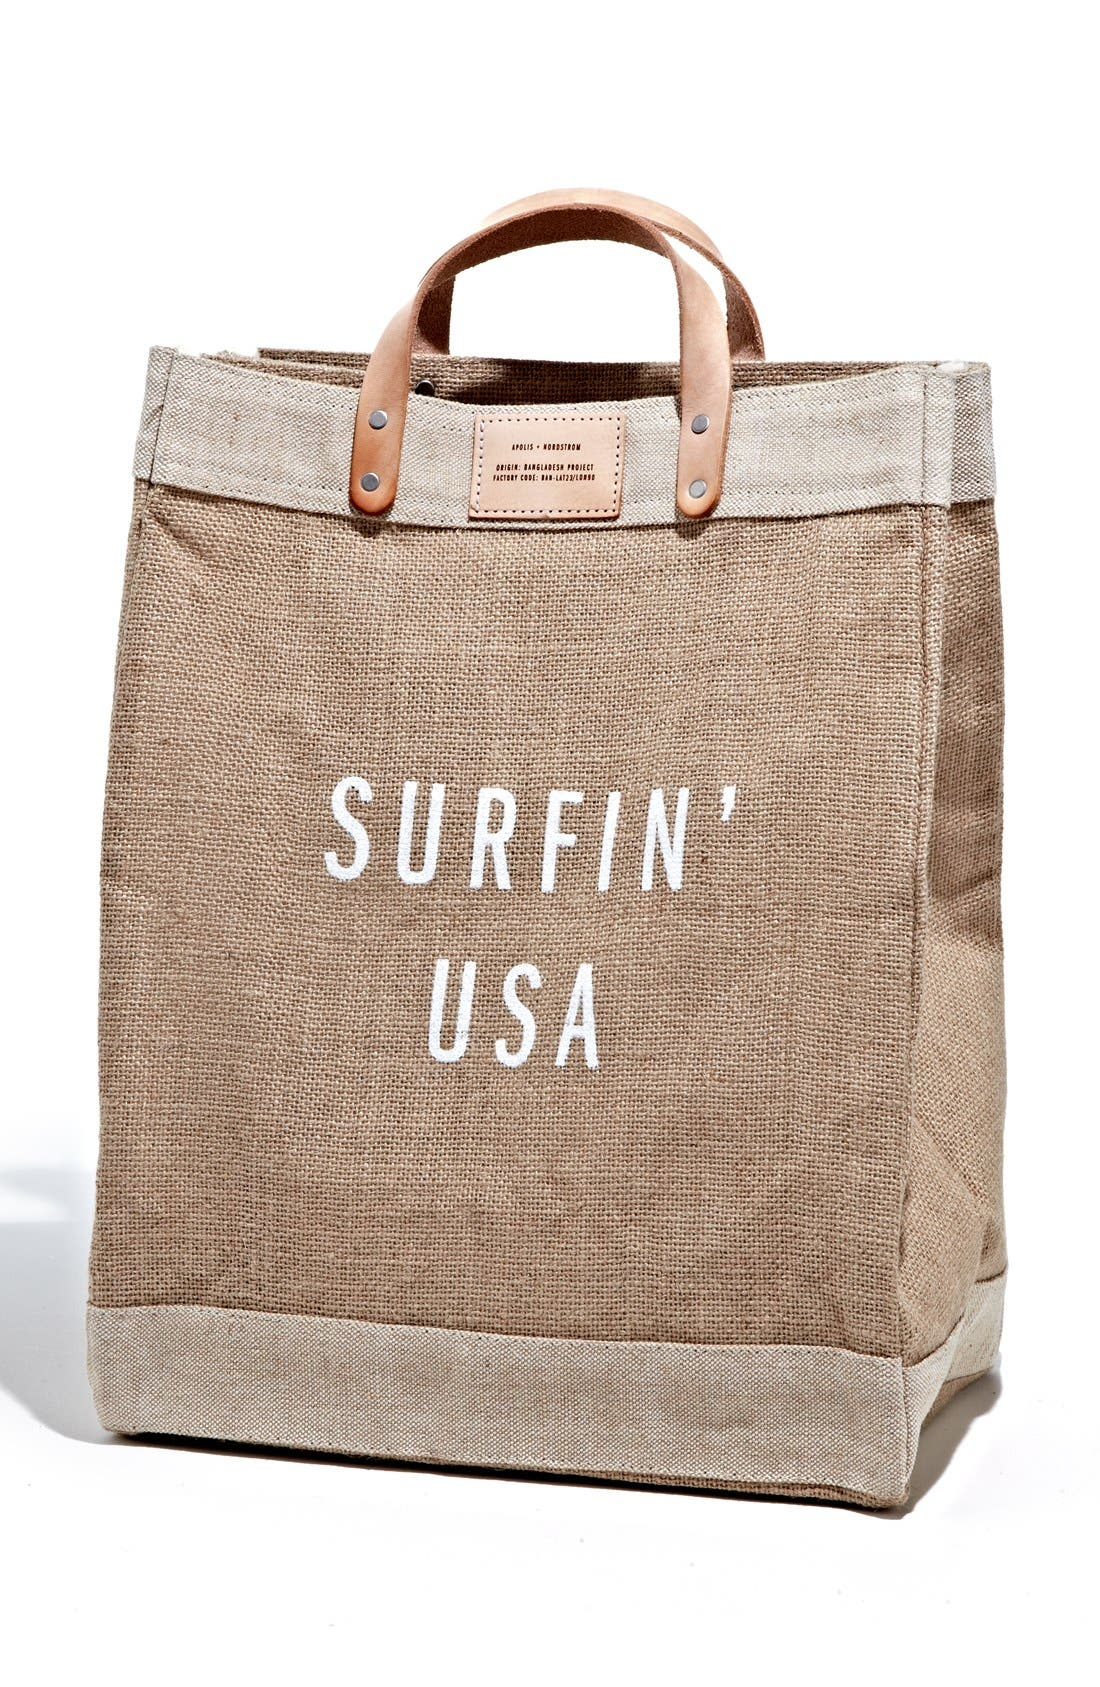 Main Image - Apolis 'Surfin USA' Market Bag